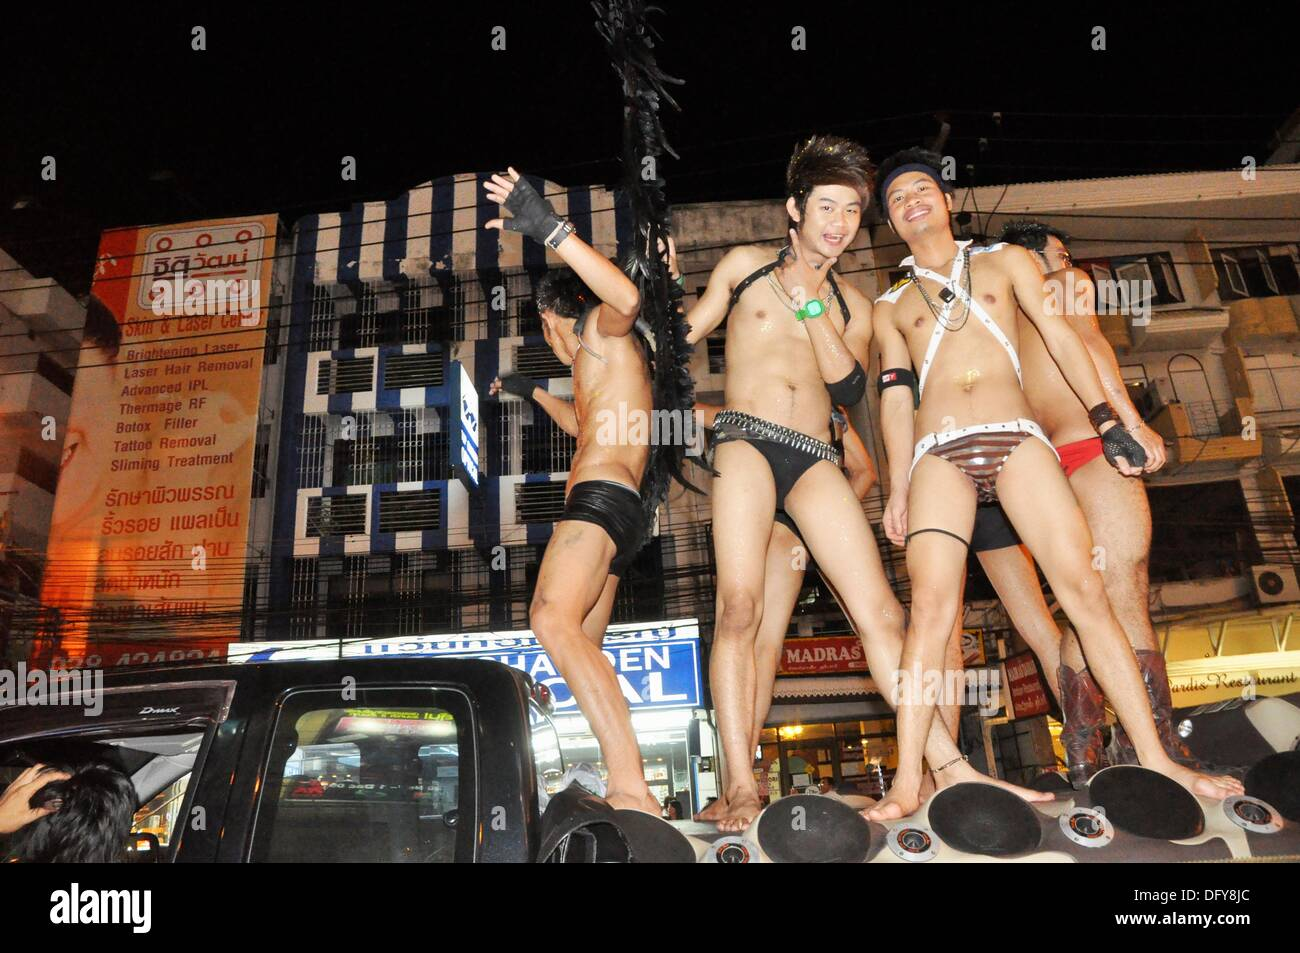 gratis  gay thai kungsbacka